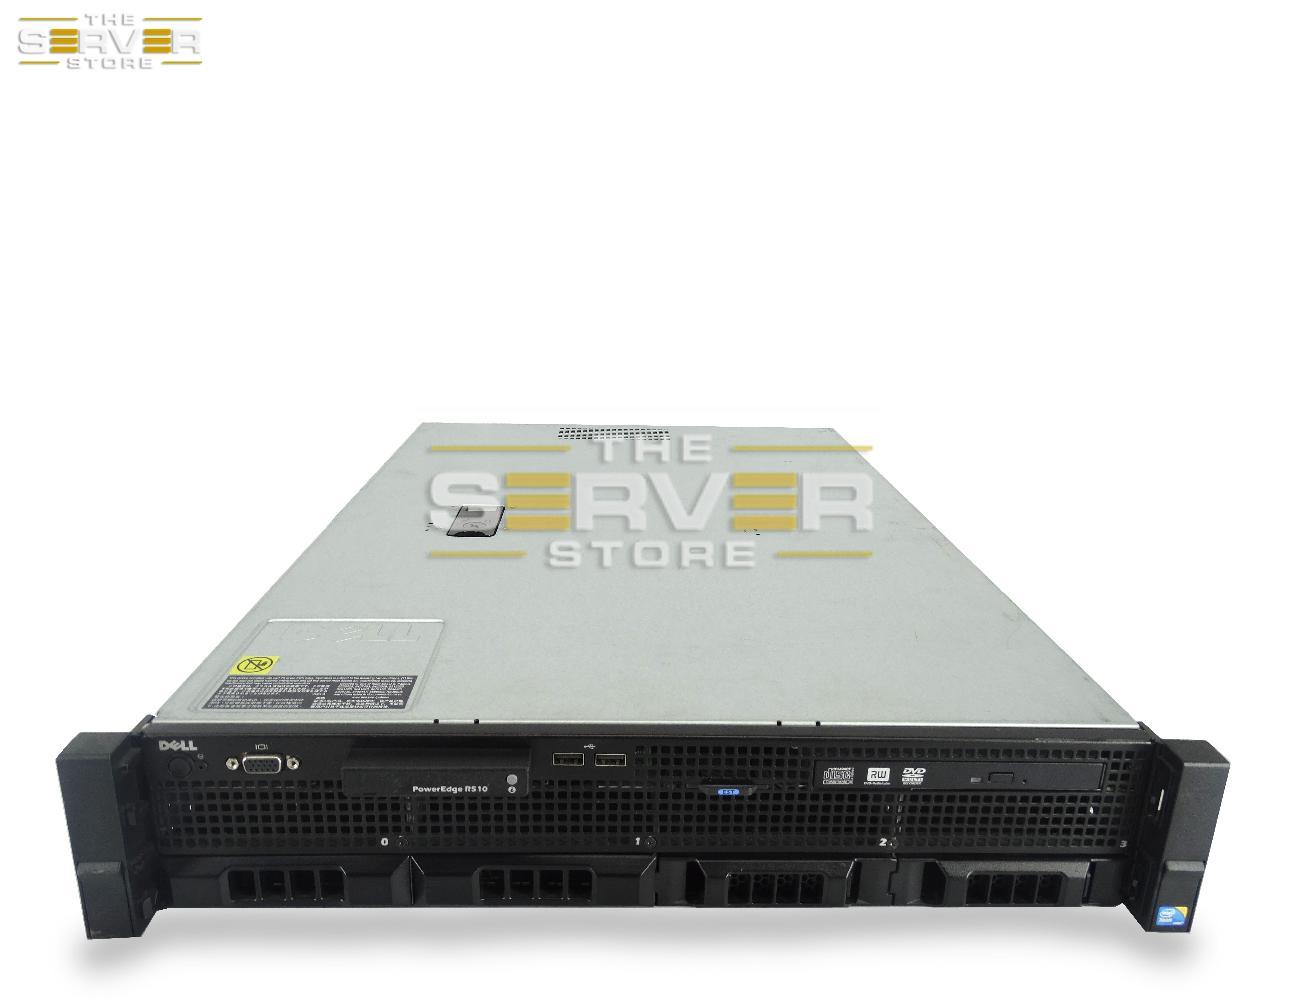 Dell PowerEdge R510 4x 2U LFF Server